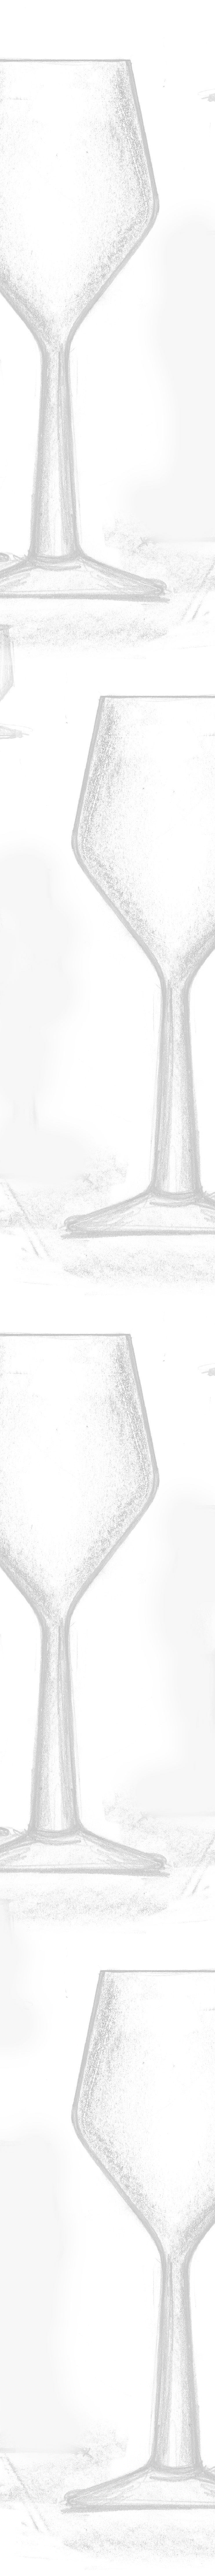 Erik Baggers skitser af Signature serien